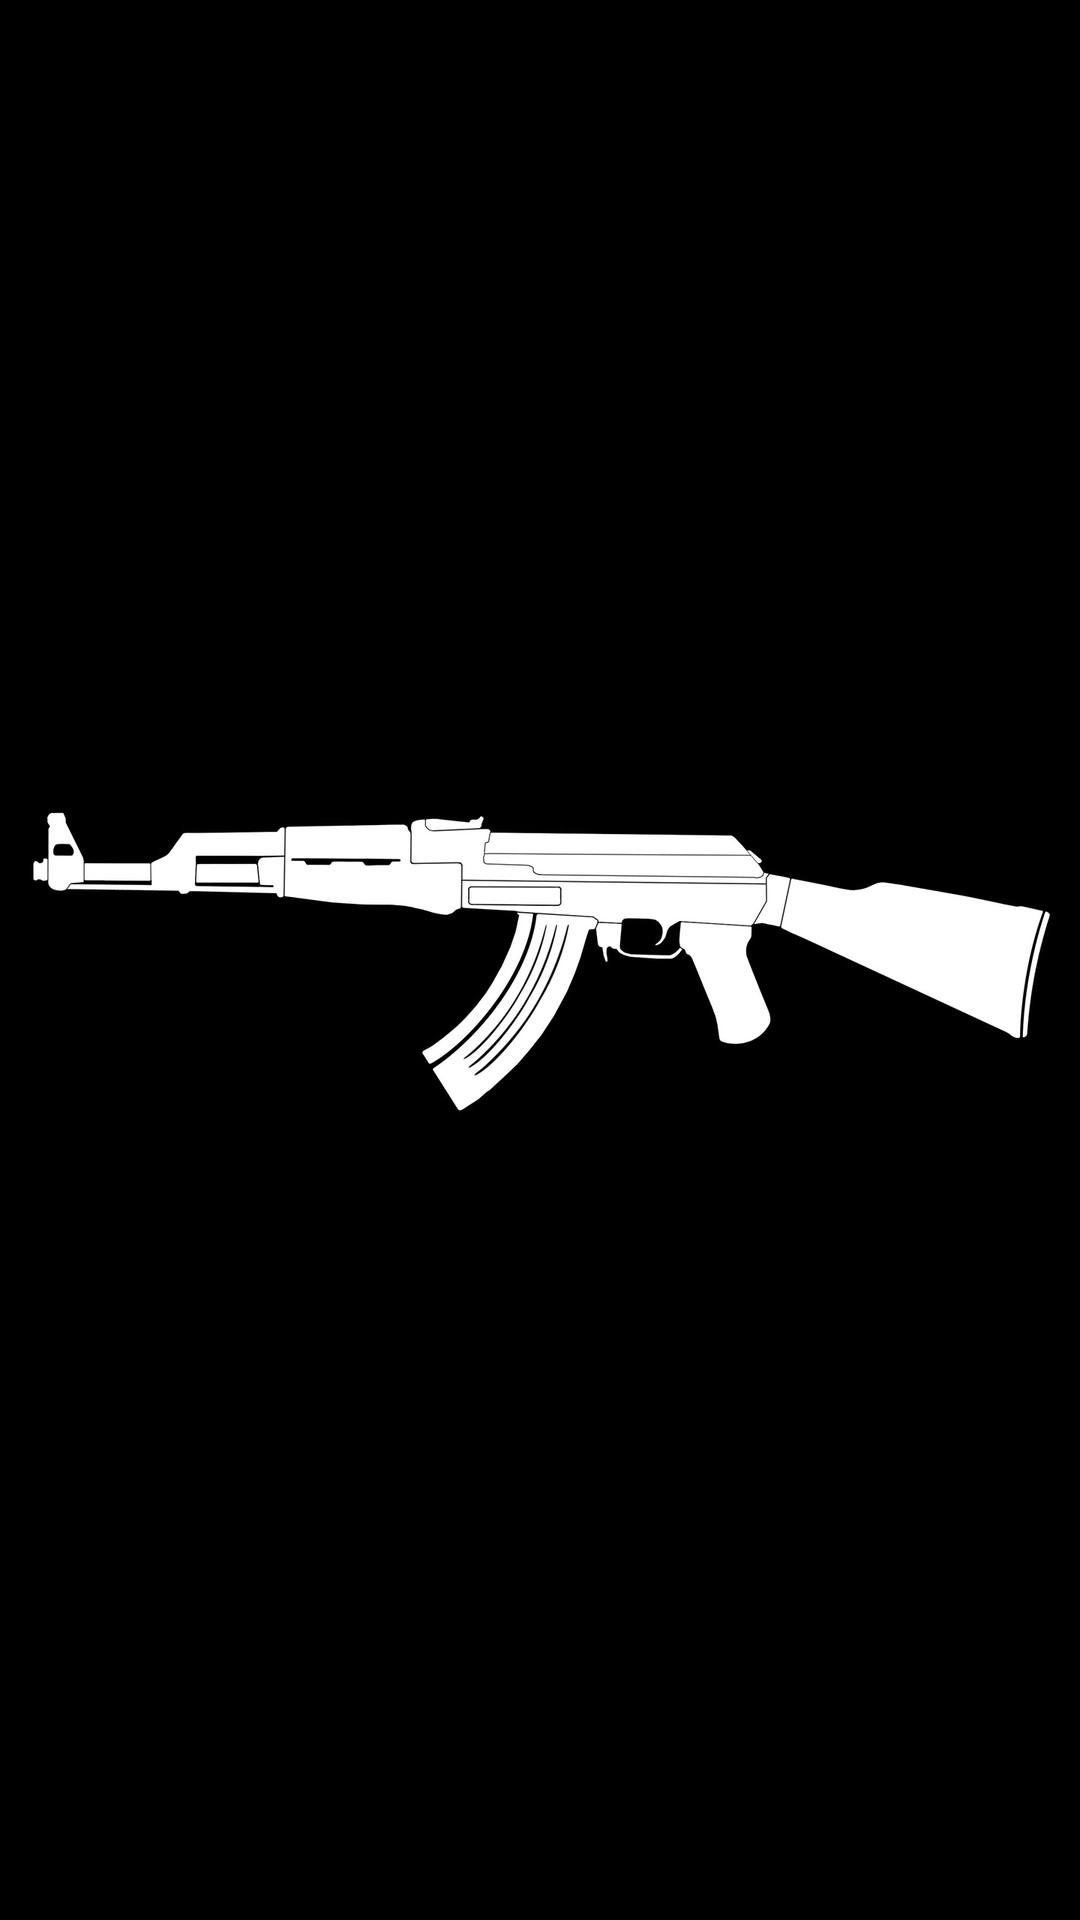 AK47 Gun iPhone Wallpaper